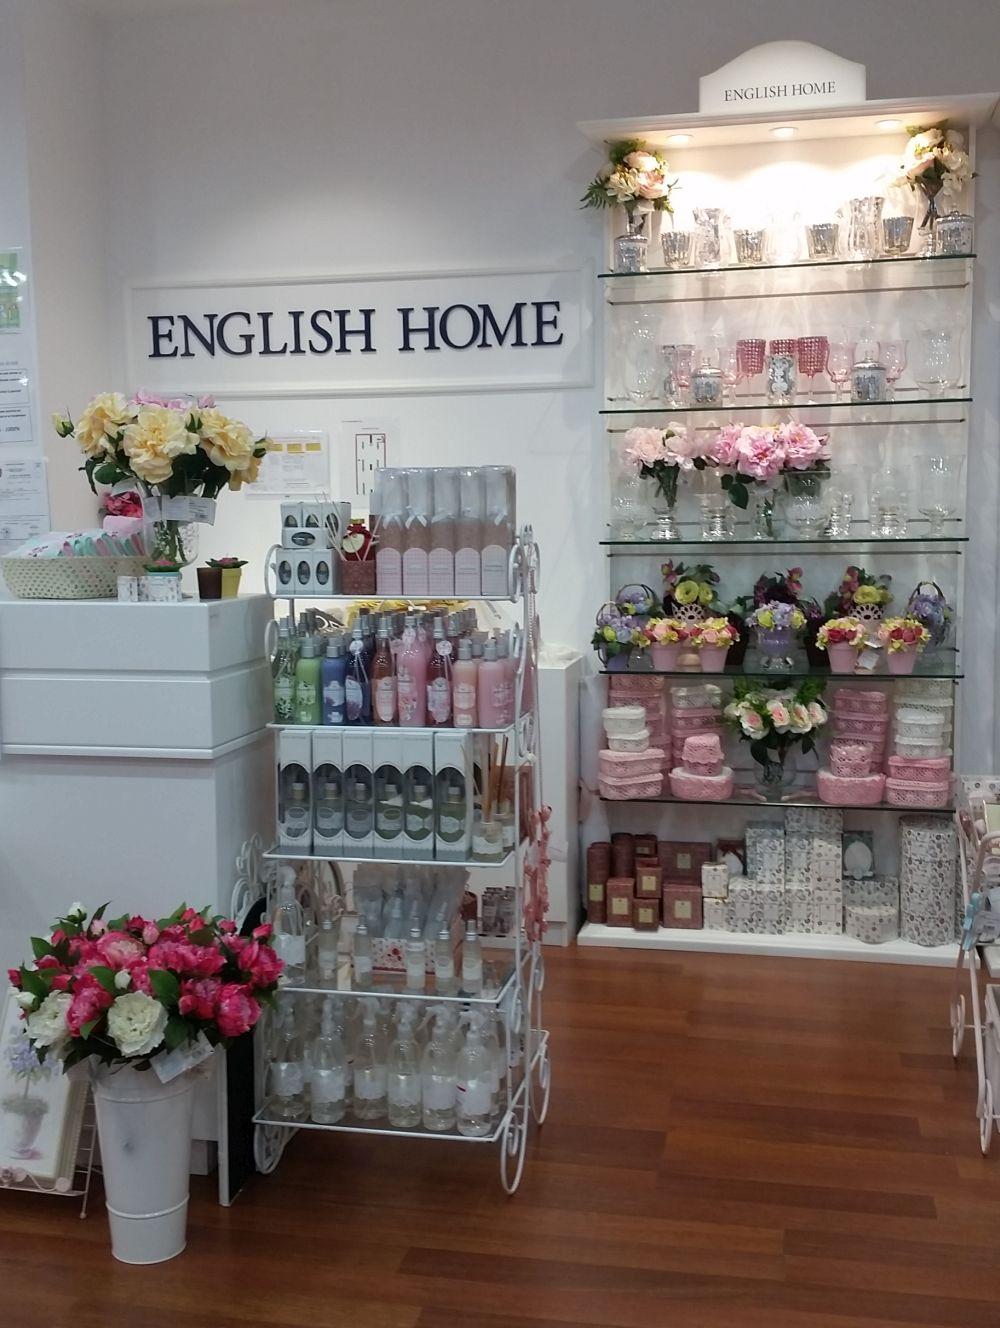 adelaparvu.com despre Bucuresti Mall, Mall Vitan, magazinul English Home (16)